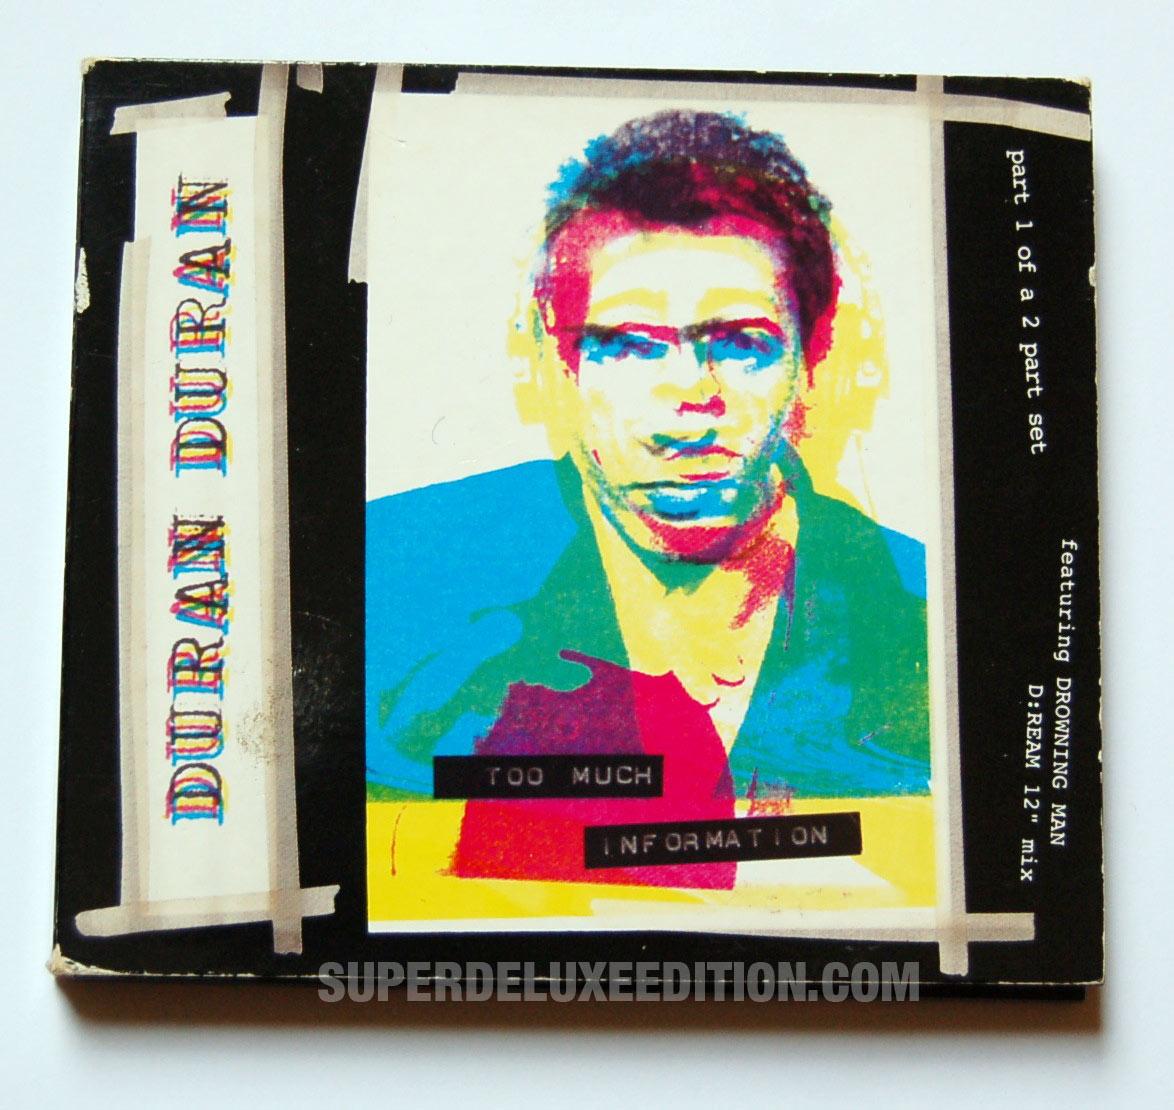 Duran Duran / Too Much Information UK CD Single